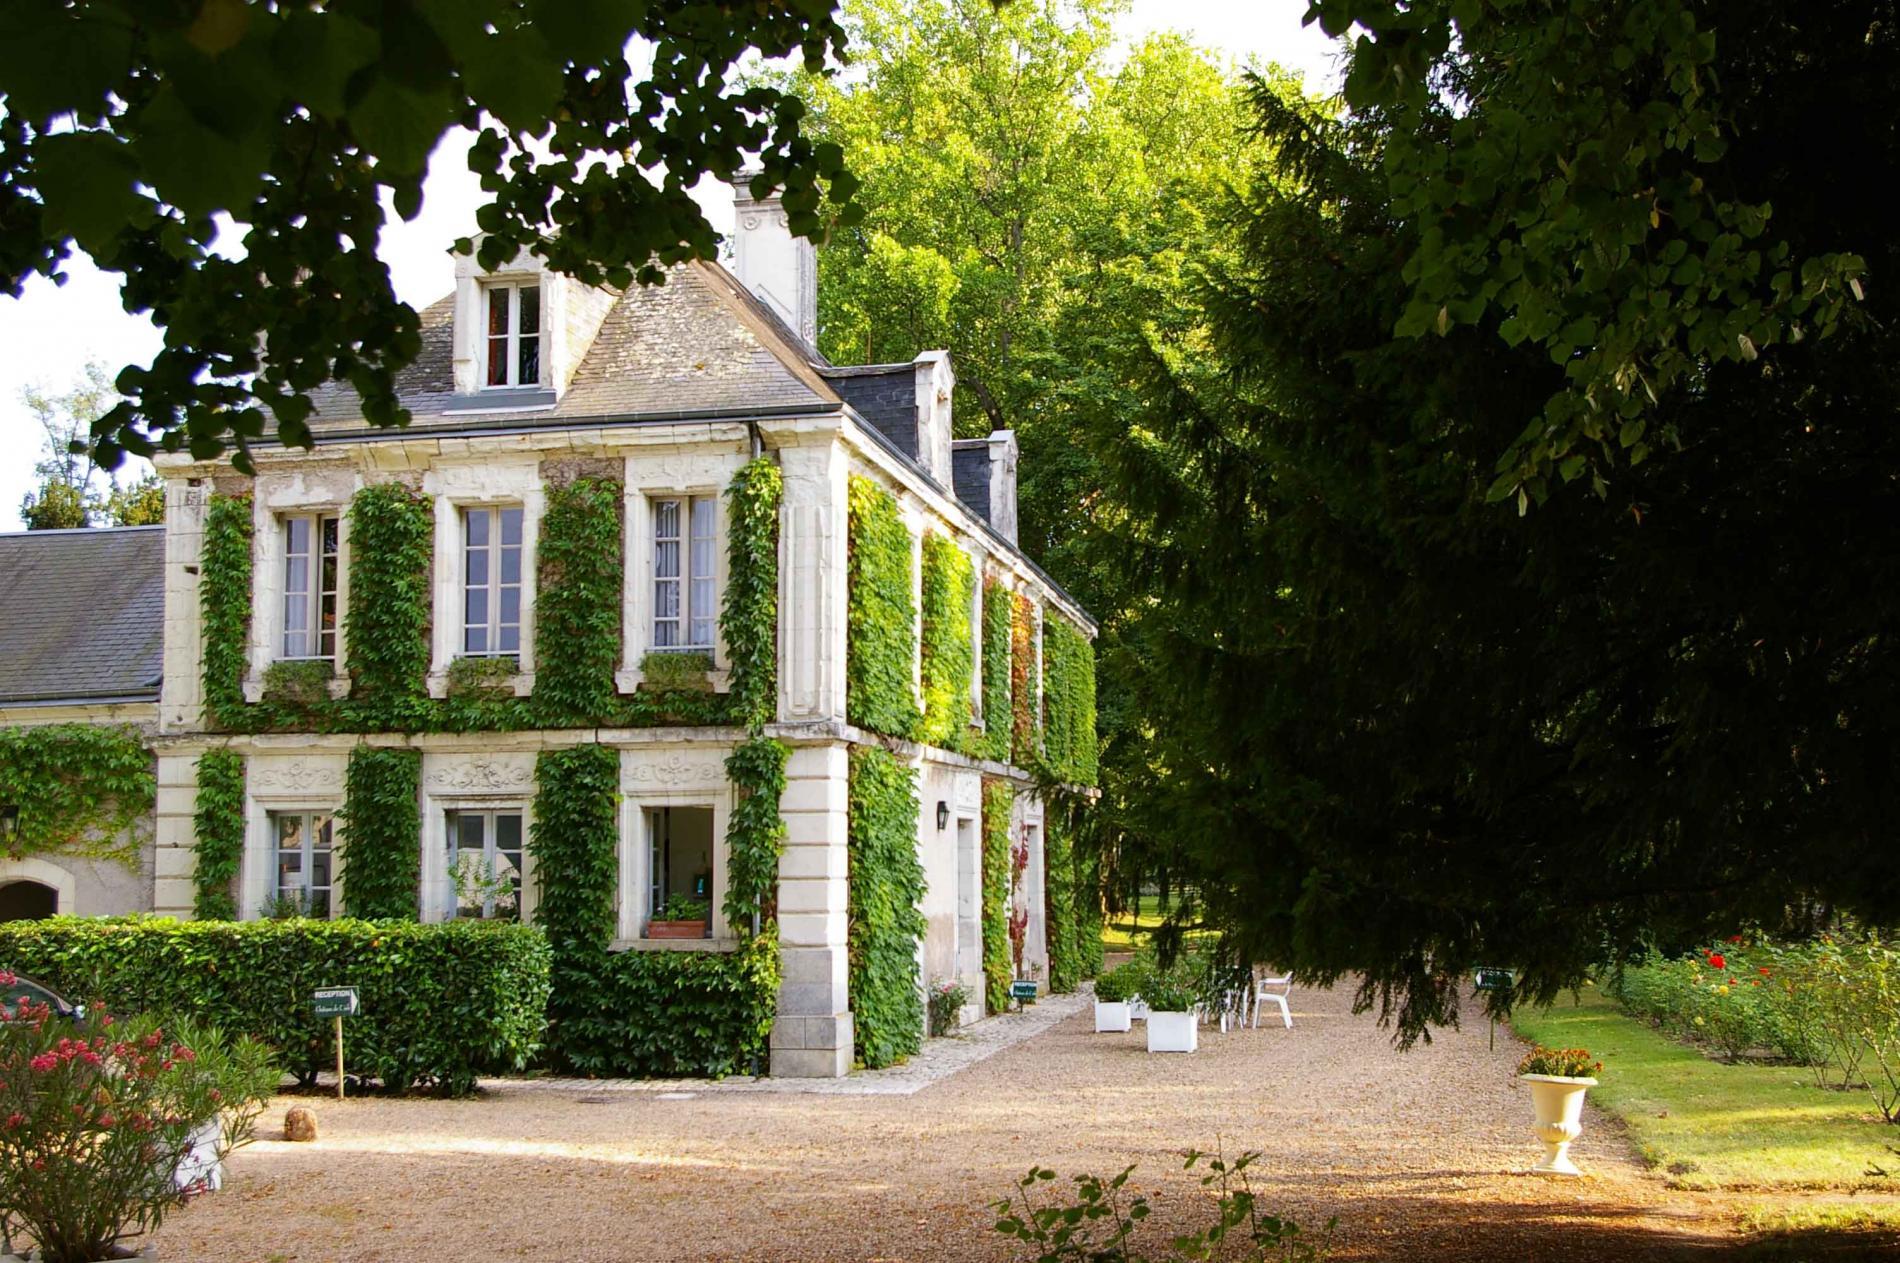 Le Château de l'Isle